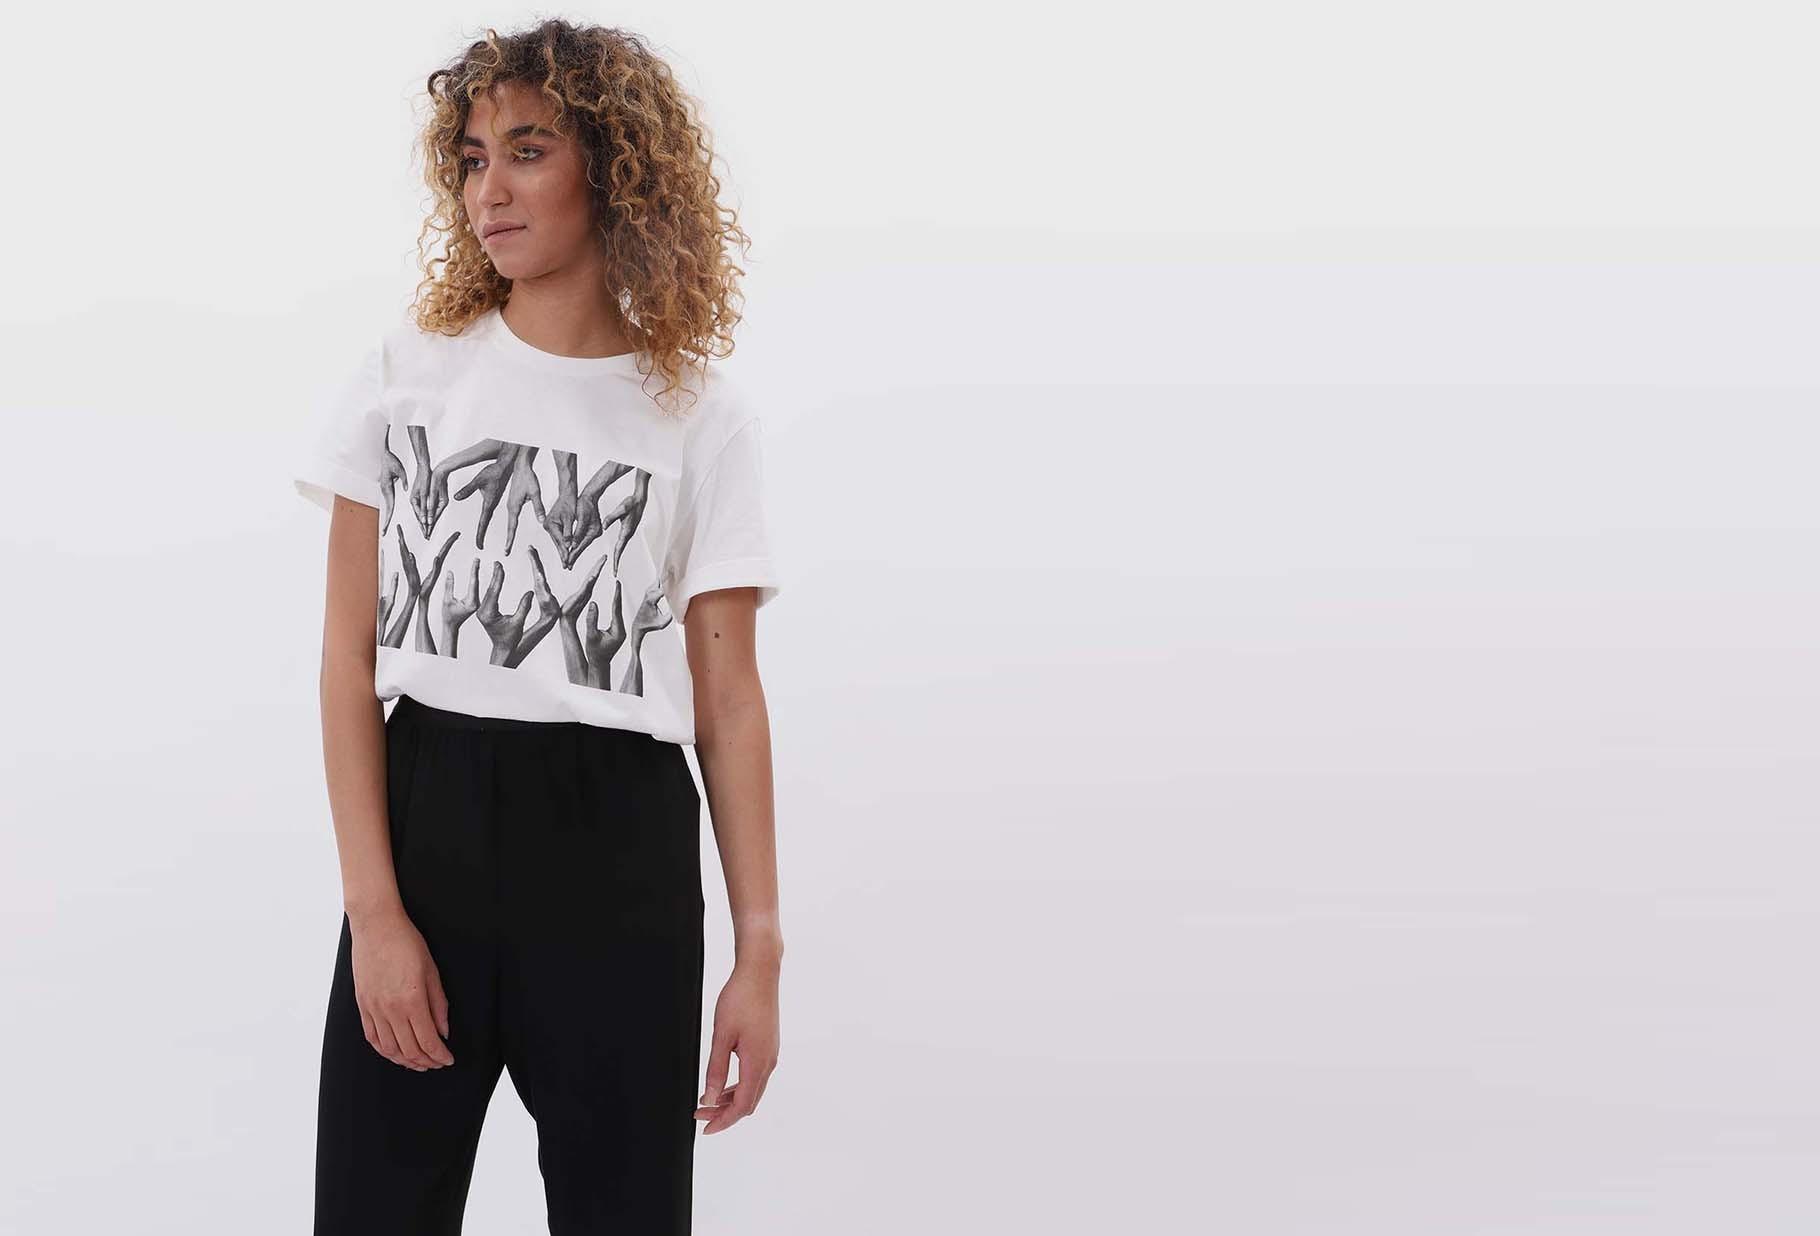 MM6 MAISON MARGIELA FOR WOMAN / Hand t-shirt White